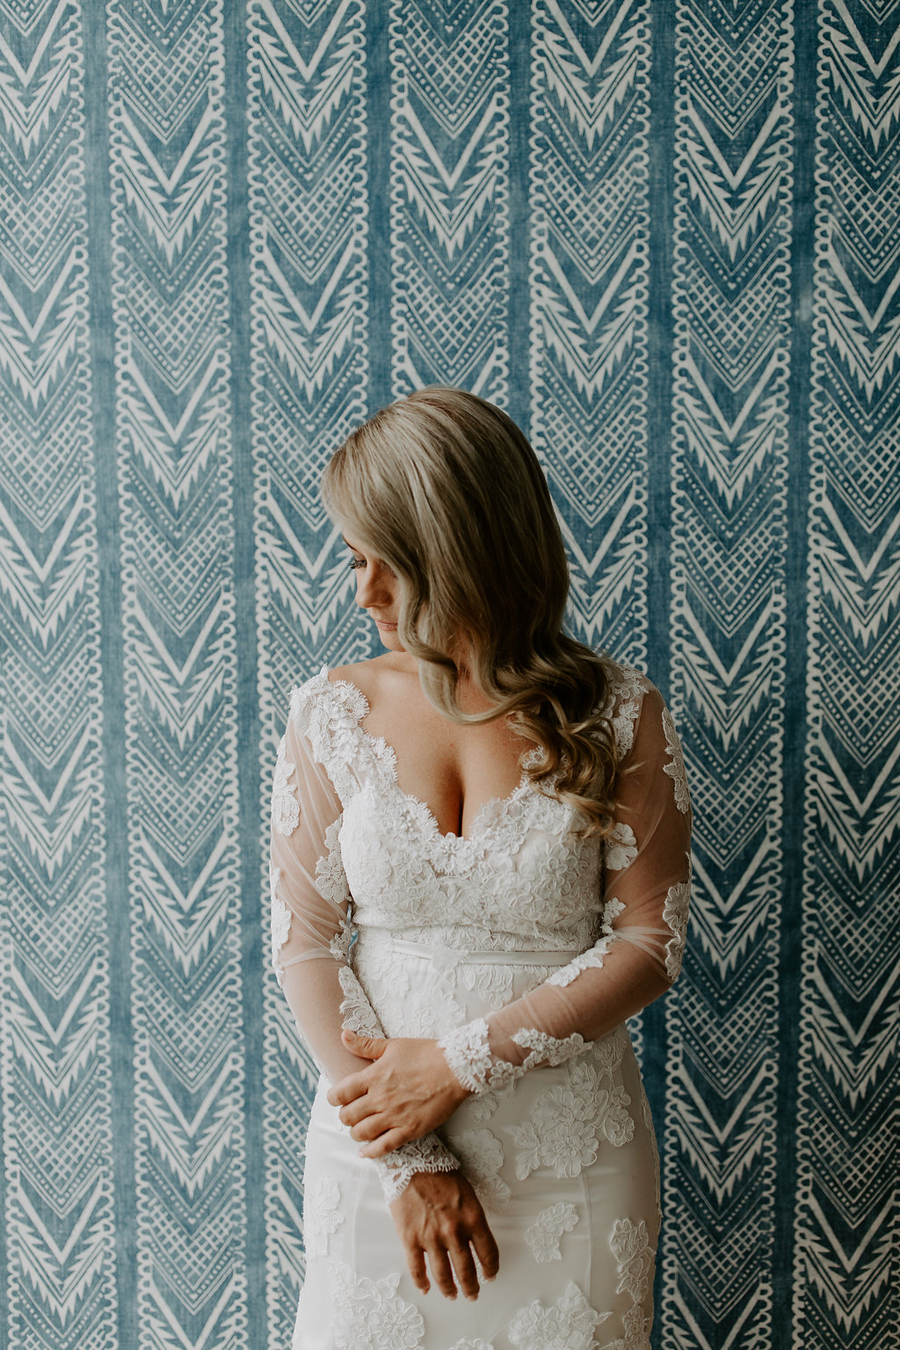 osteria-casuarina-wedding-venue-tweed-coast-weddings-coastal-garden-reception-real-wedding007.jpg